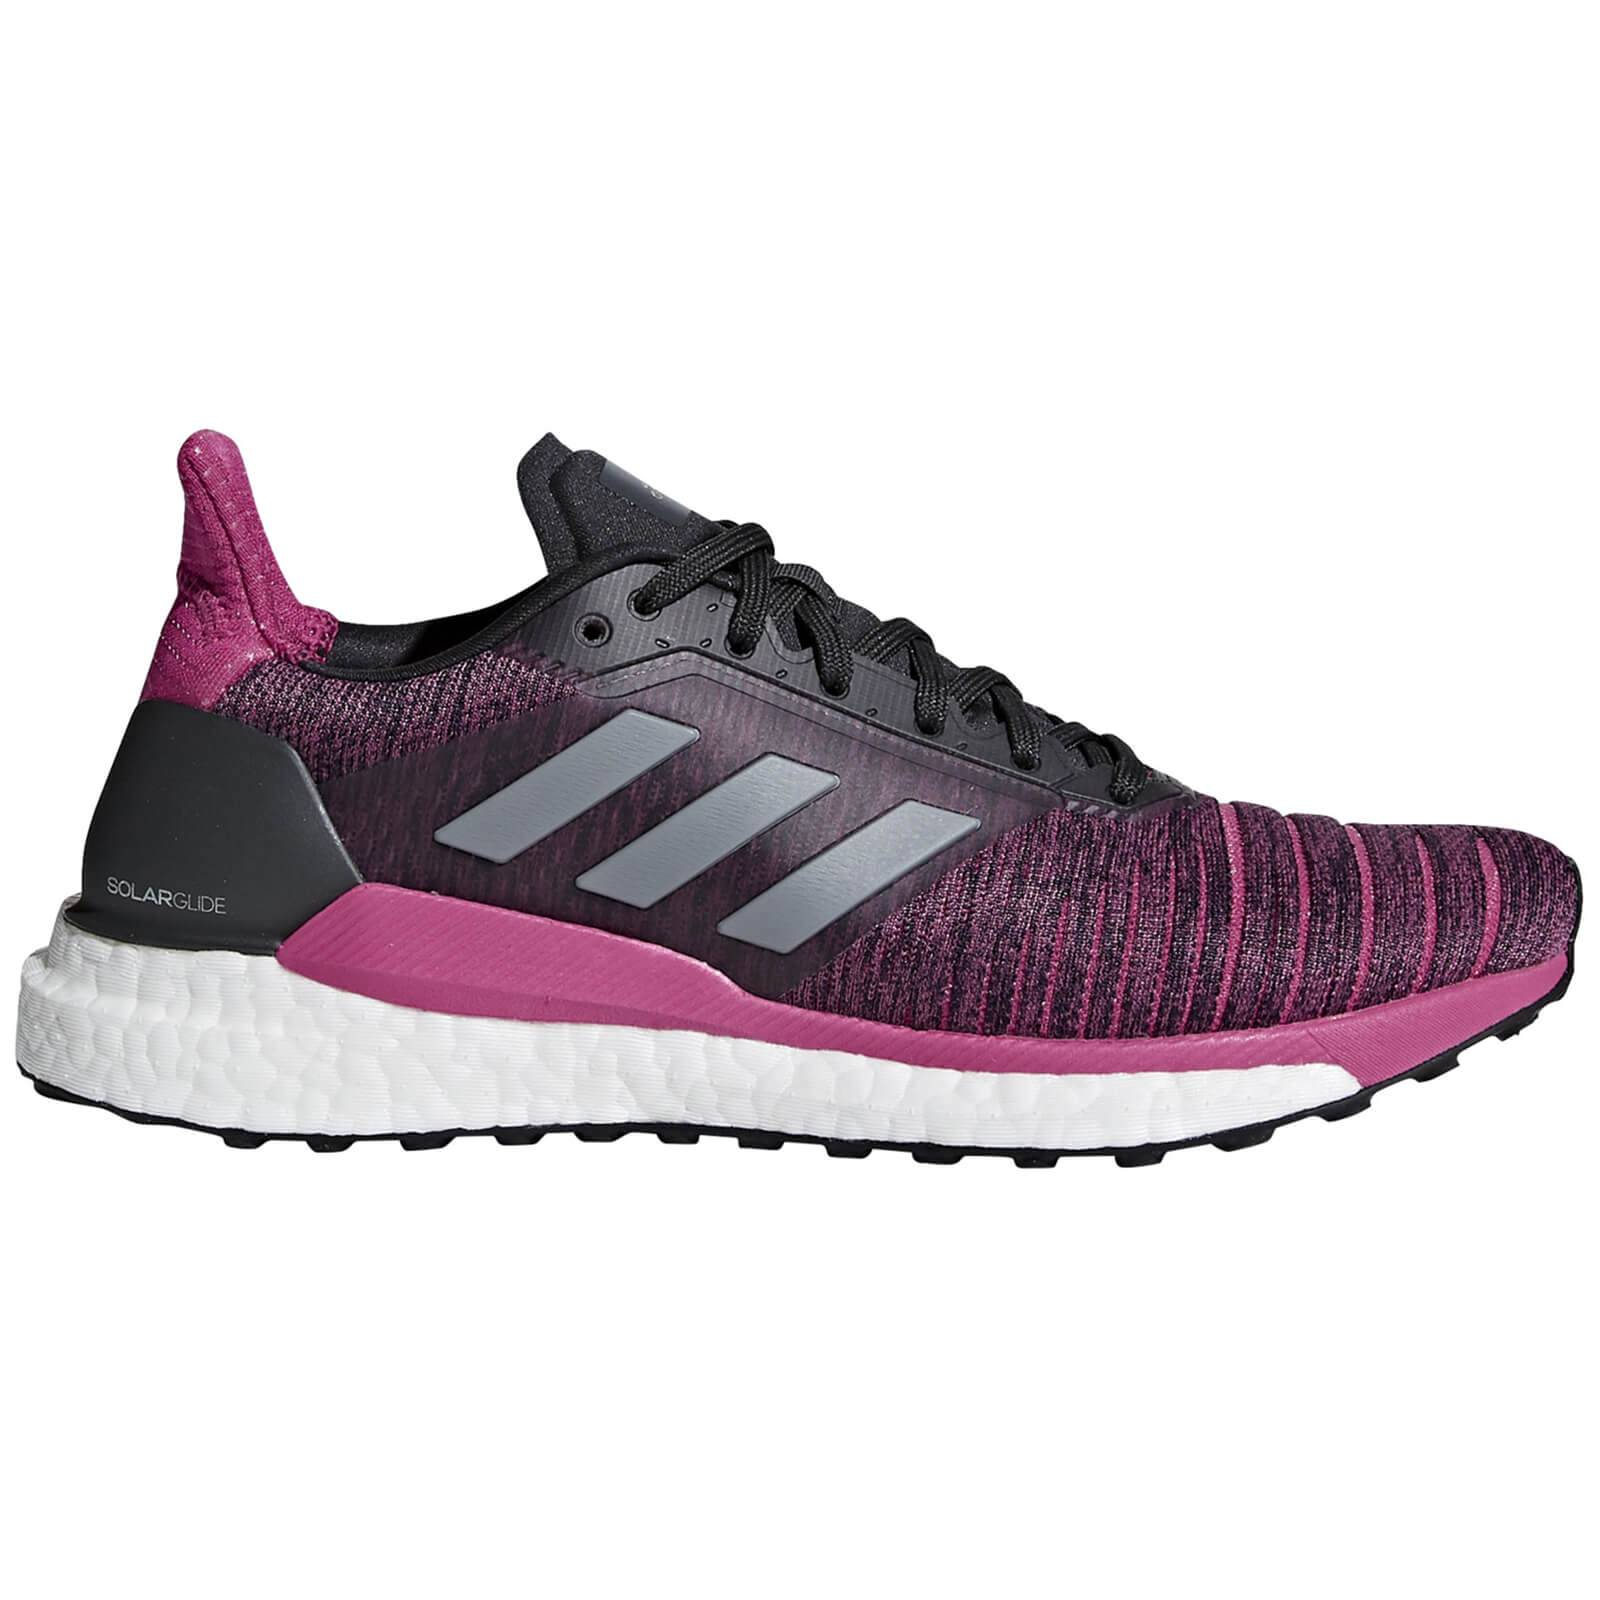 adidas Women's Solar Glide Running Shoes - Grey/Magenta - US 7.5/UK 6 - Grey/Pink